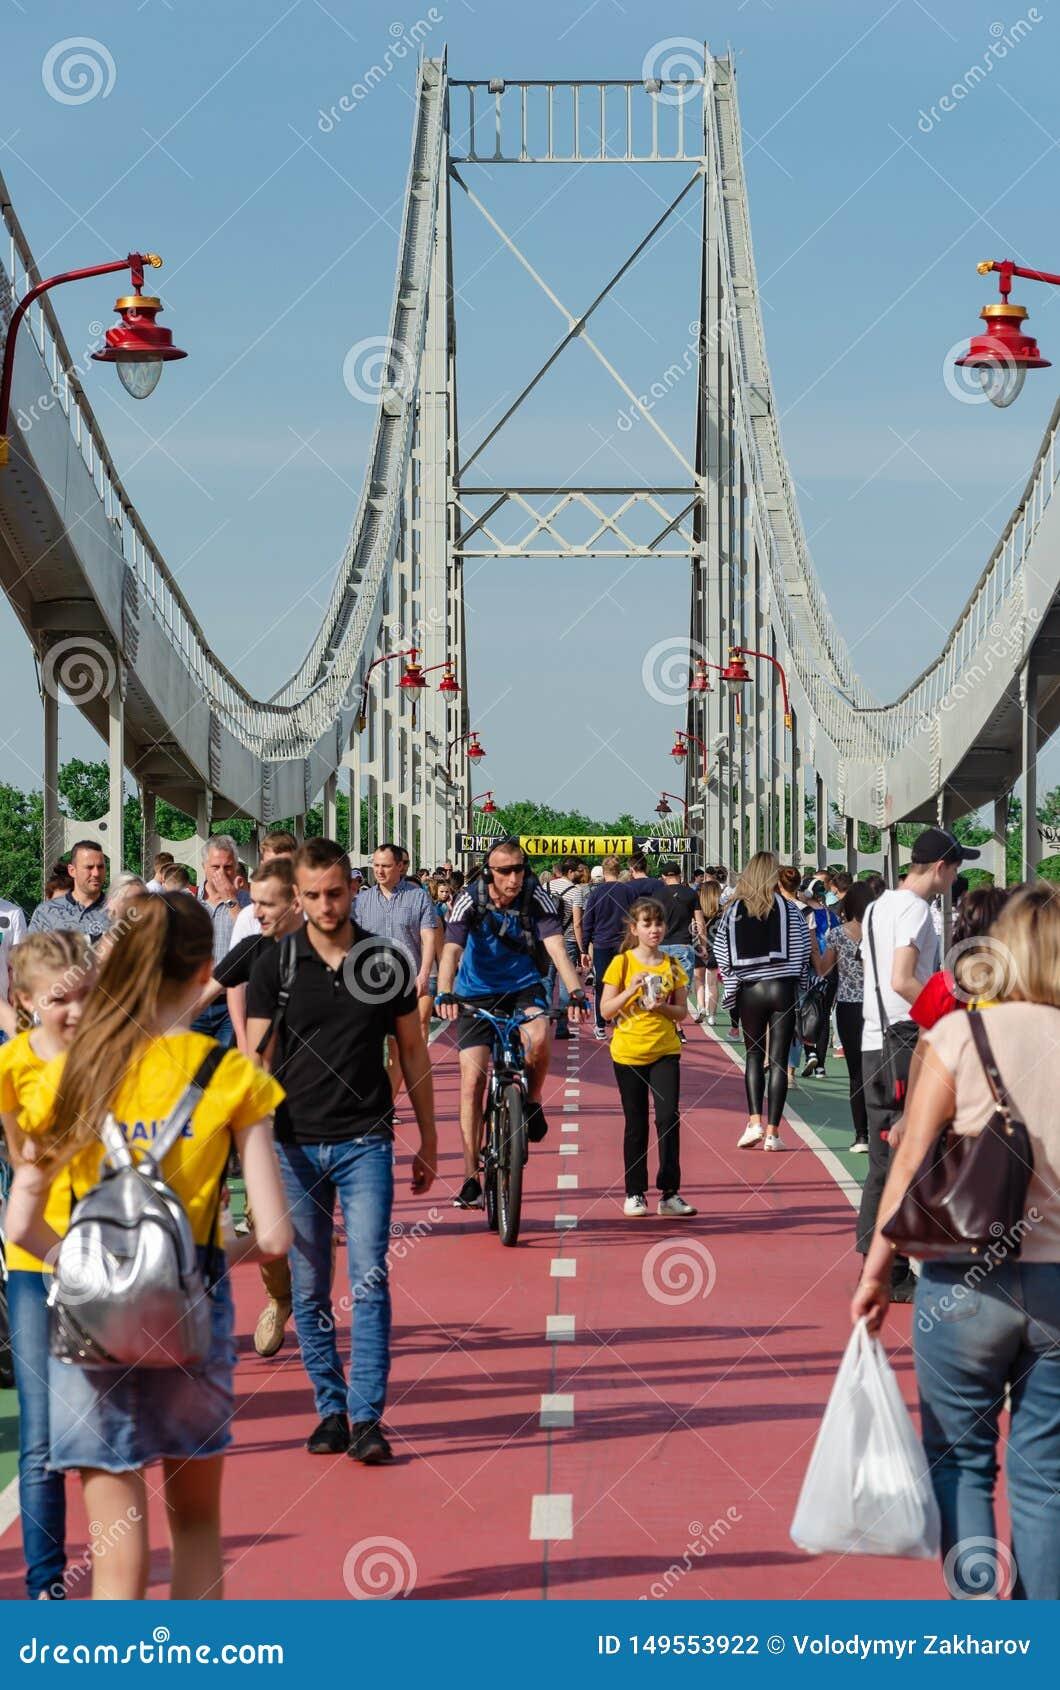 Kyiv, Ukraine - May 18, 2019. Park bridge over the Dnipro river. People walking along the pedestrian bridge on weekend